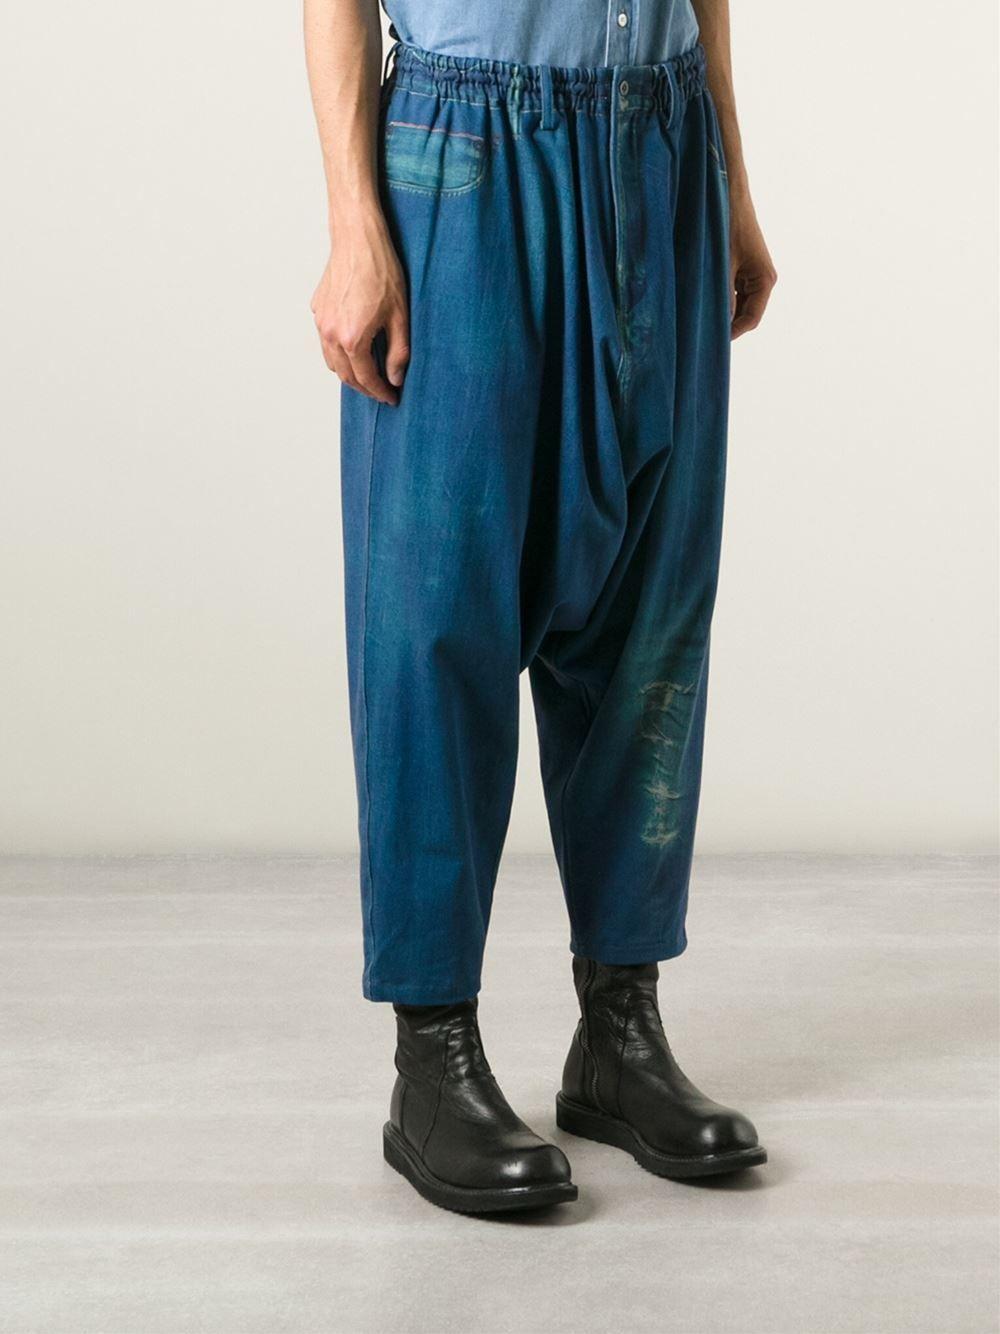 drop-crotch tracksuit trousers - Blue Yohji Yamamoto Best Wholesale Cheap Online Best Wholesale Online To Buy Sv17ZS1zw